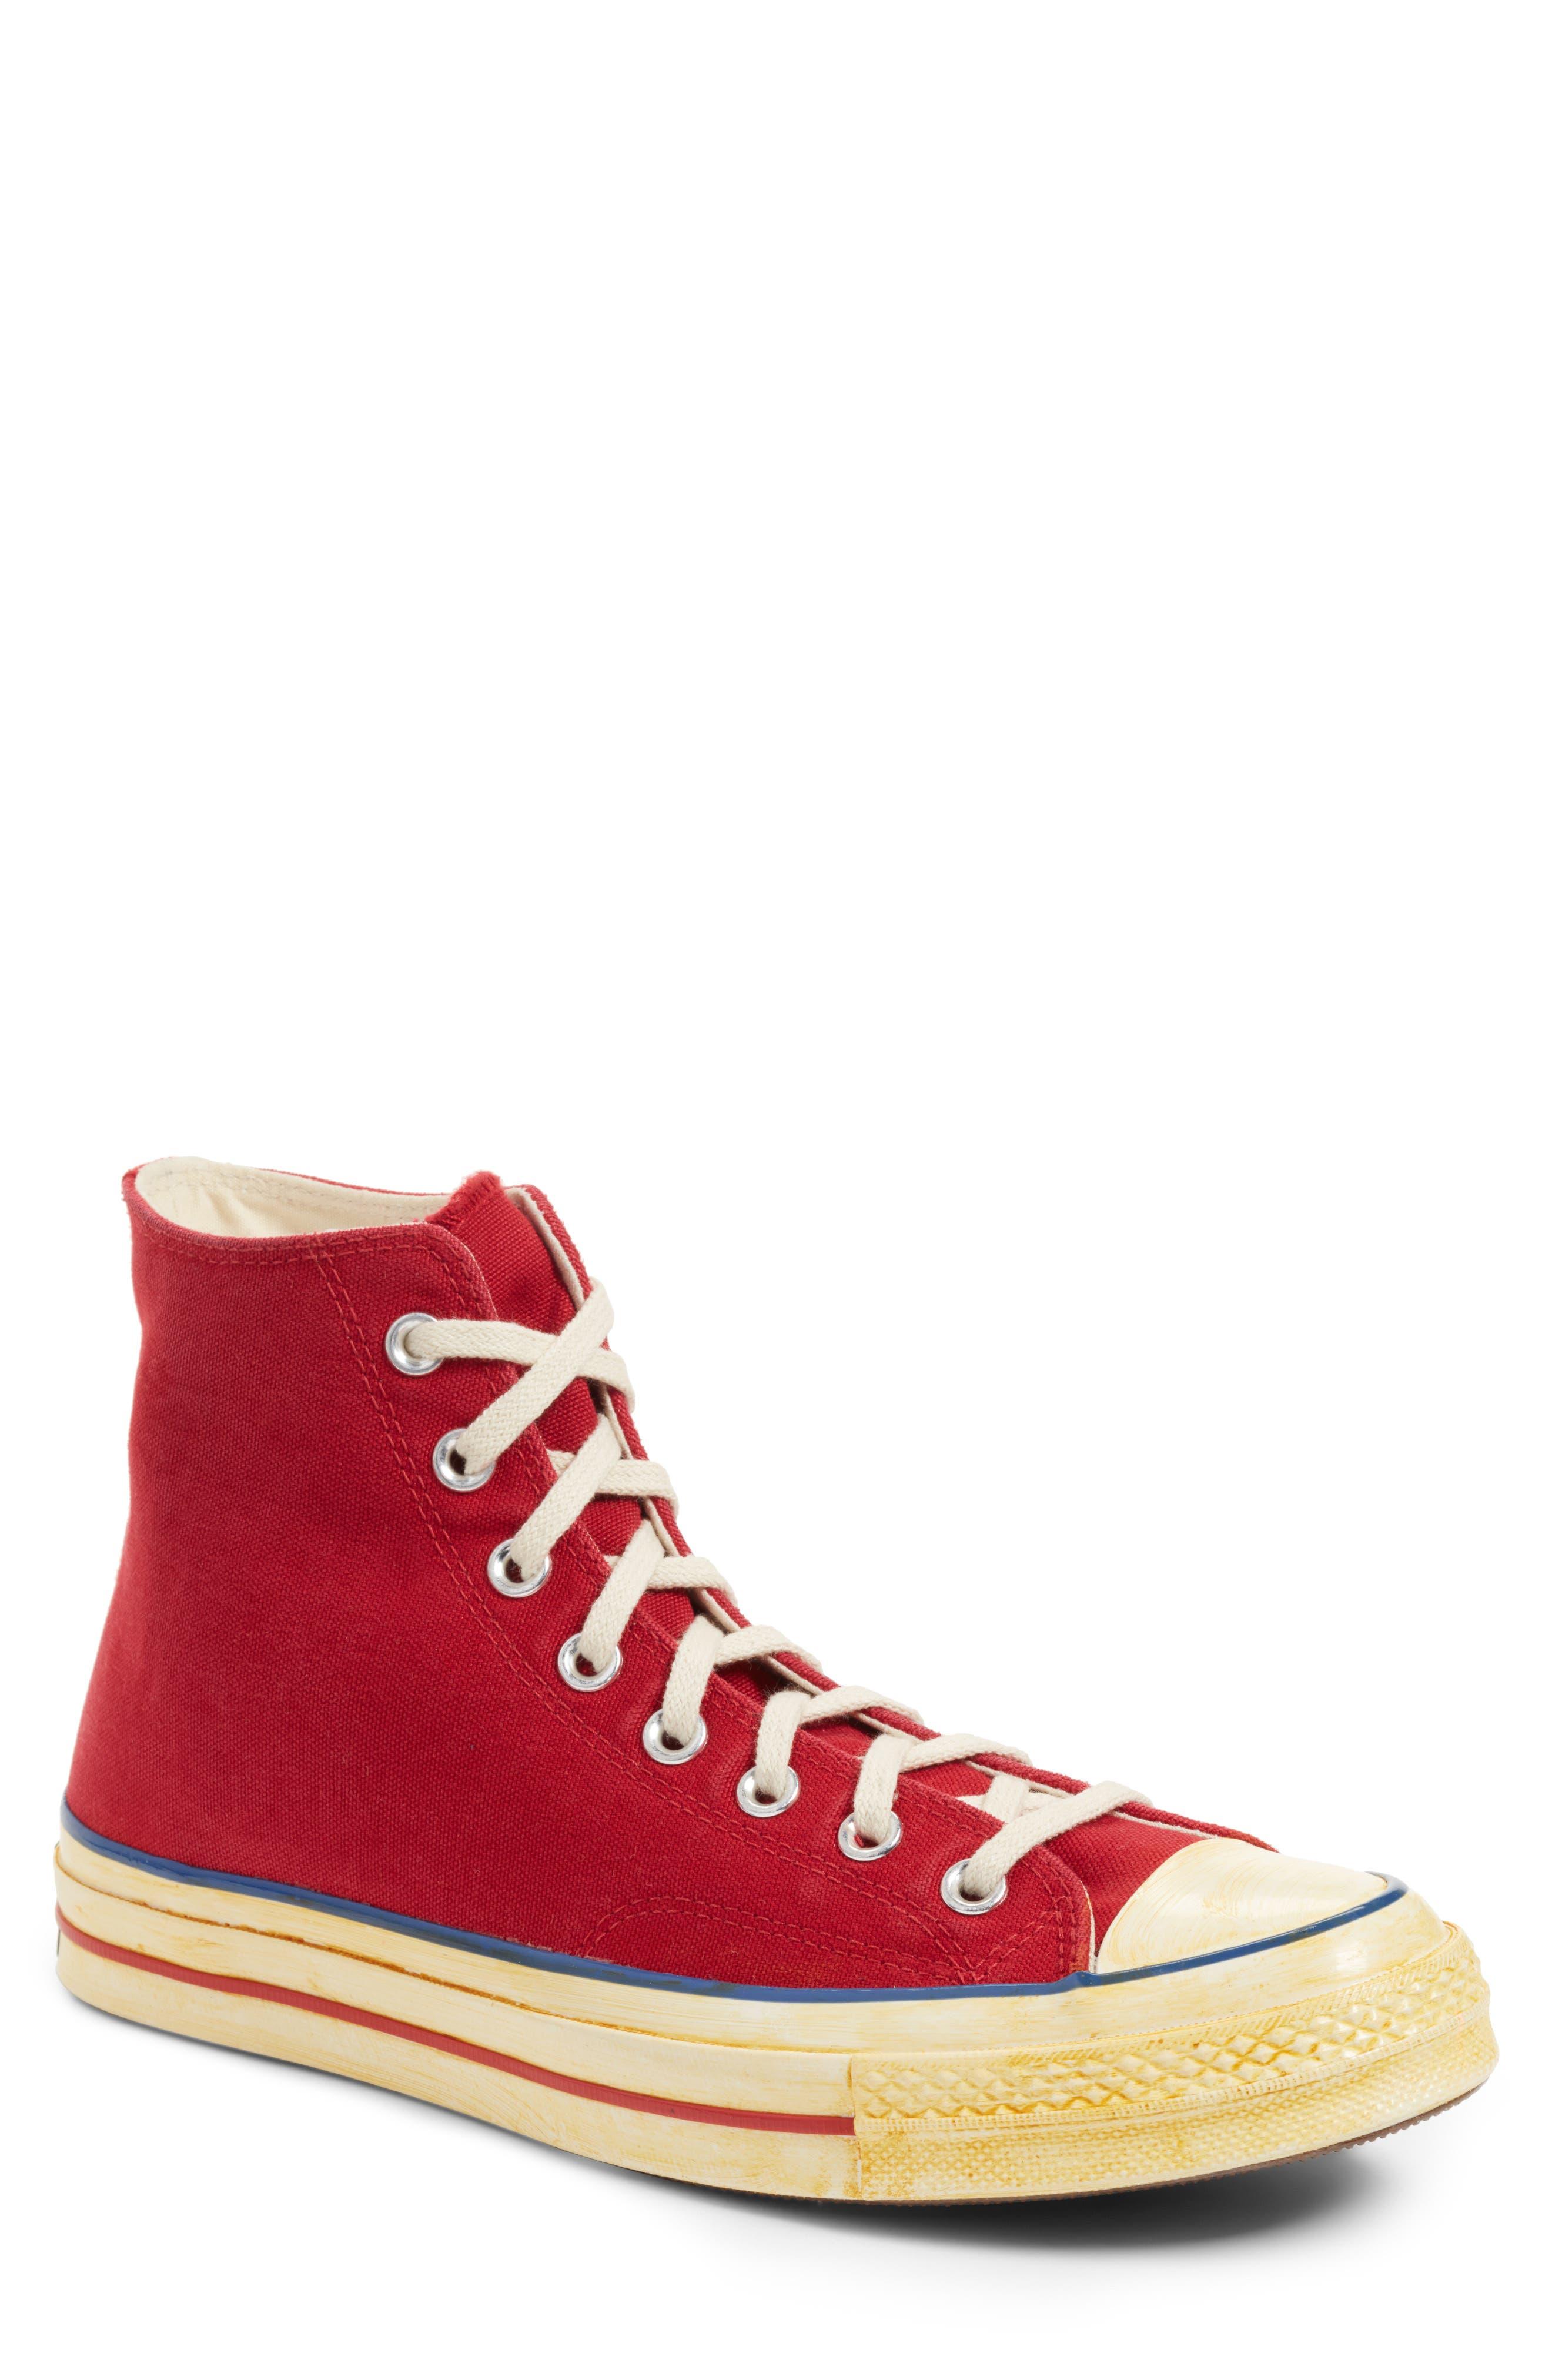 Alternate Image 1 Selected - Converse Chuck Taylor® All Star® 70 High Top Sneaker (Men)